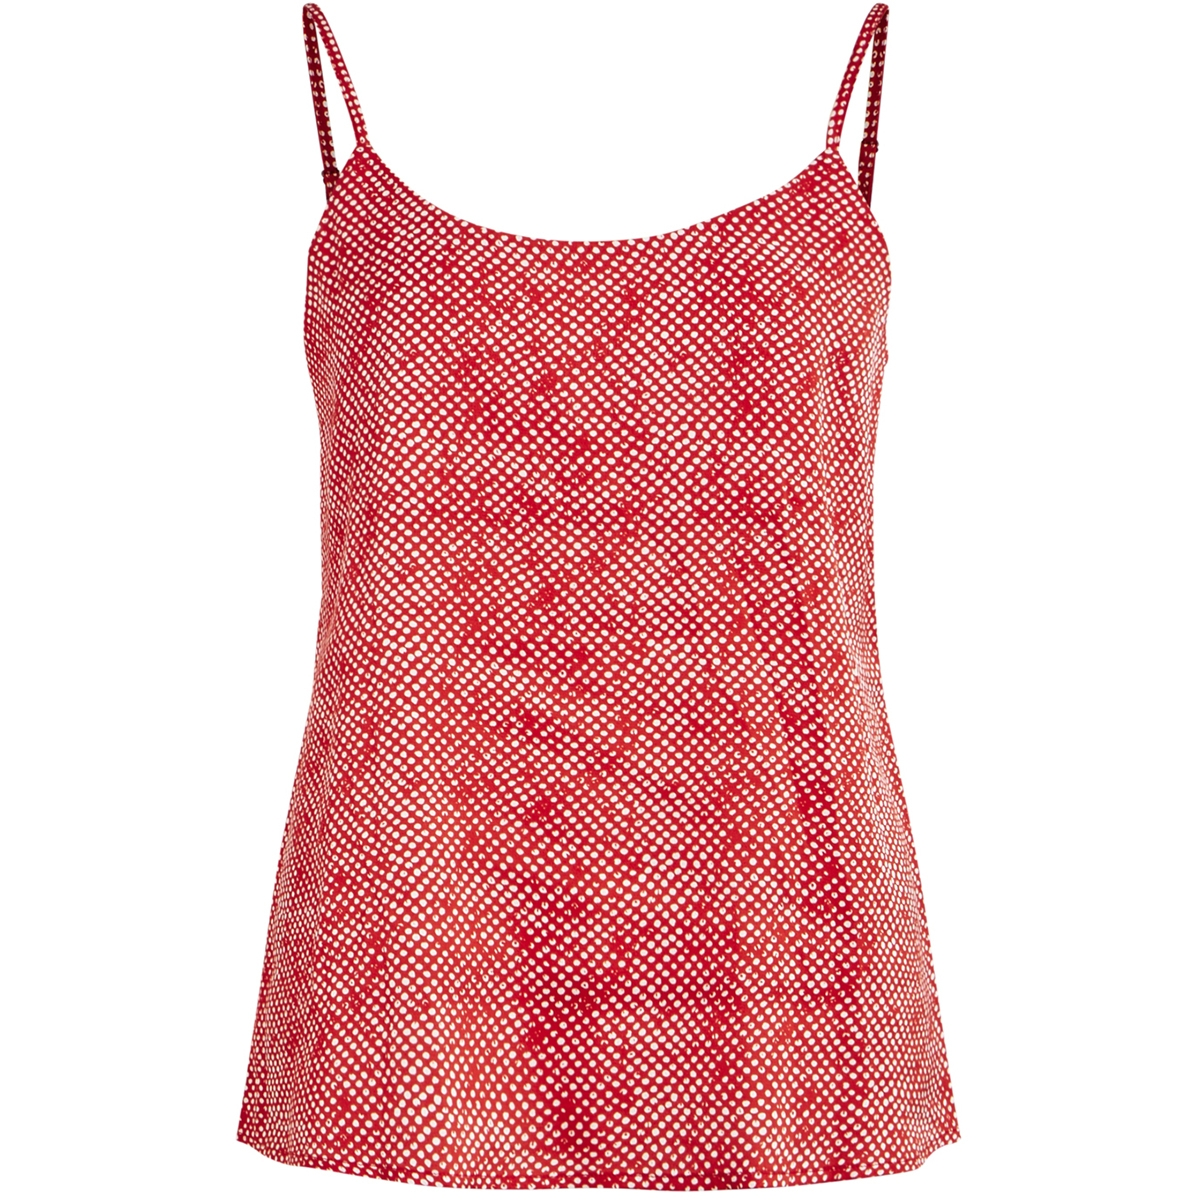 vispotly singlet/l 14056611 vila top scarlet sage